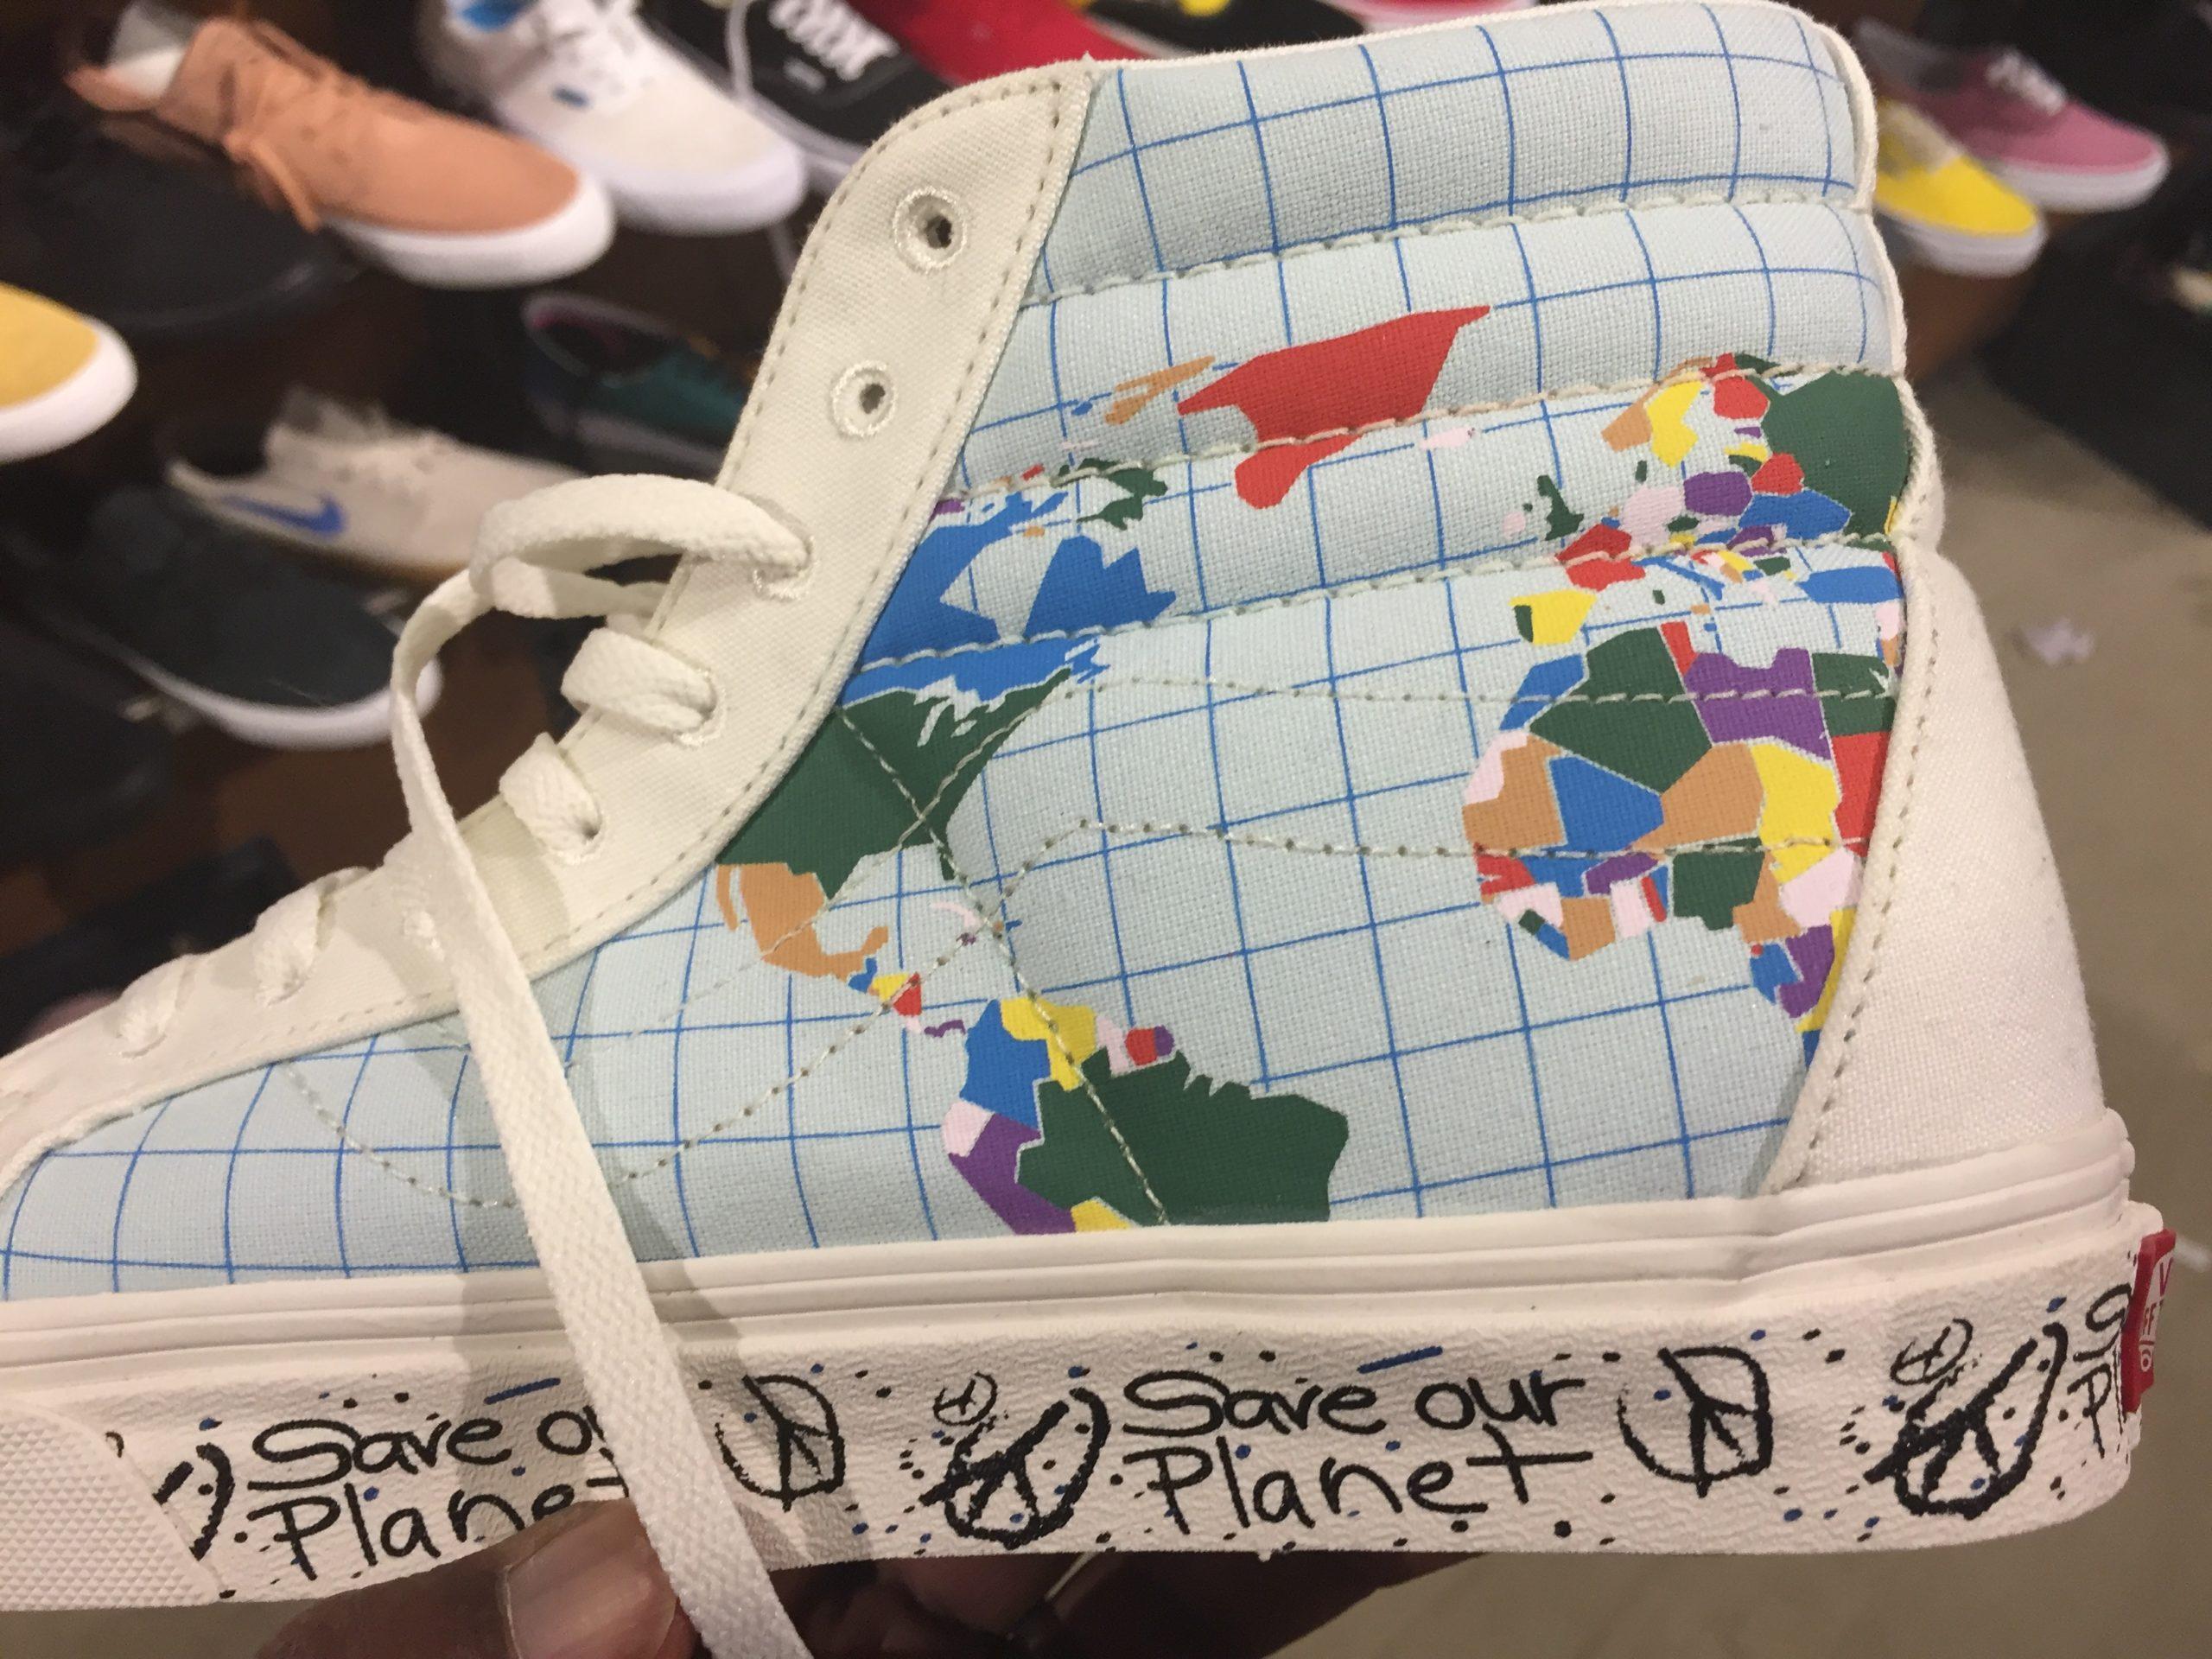 Vans Sk8 Hi Reissue Save Our Planet White Multicolor